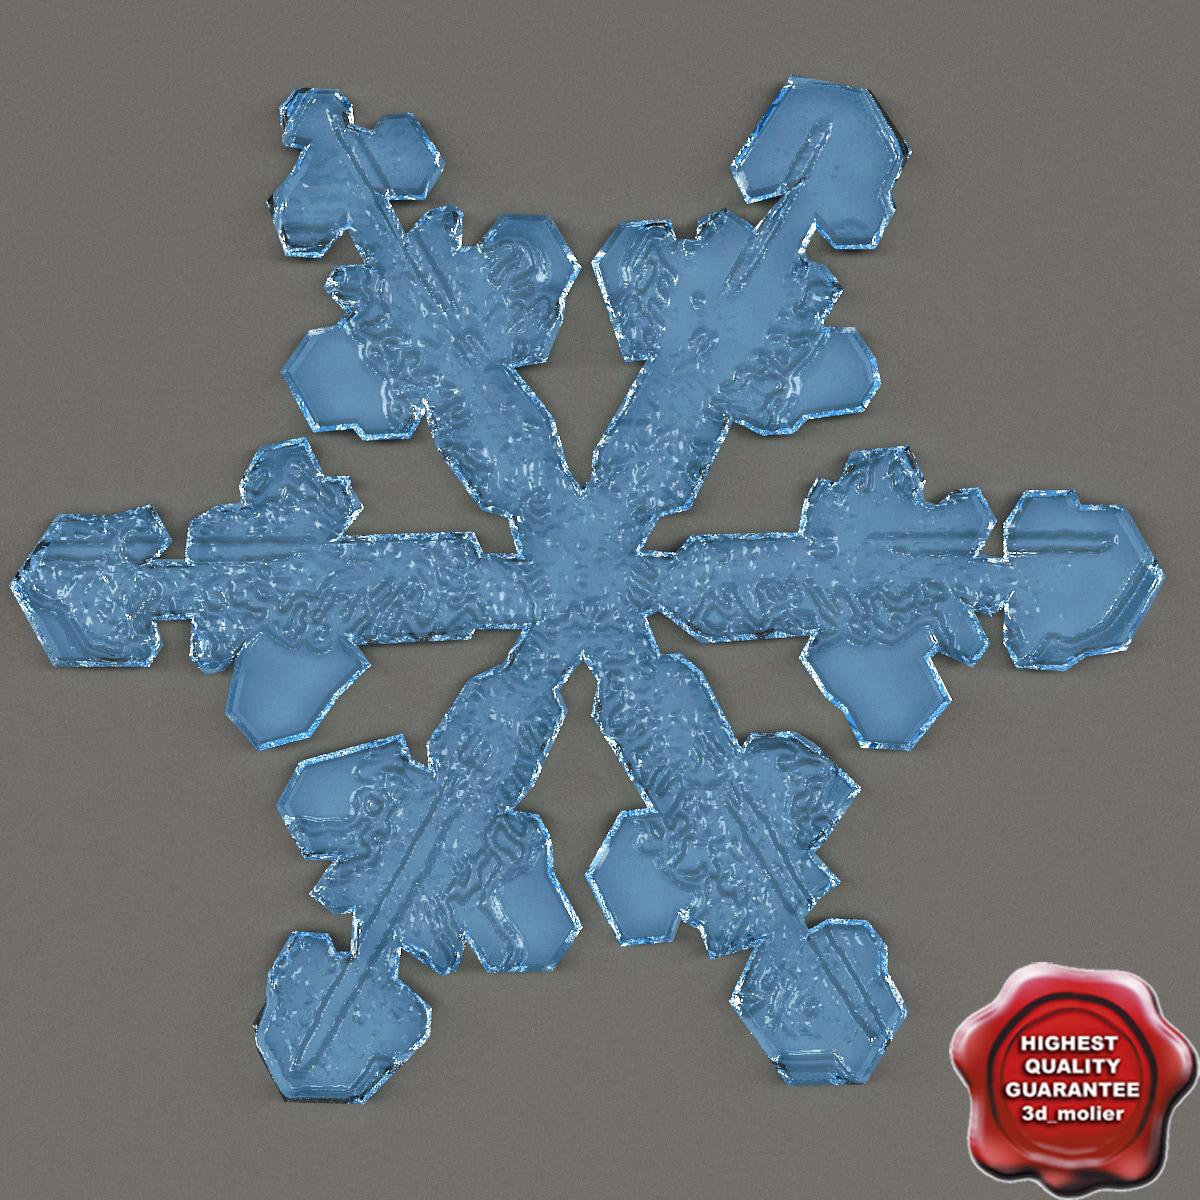 Snowflake_V2_0.jpg